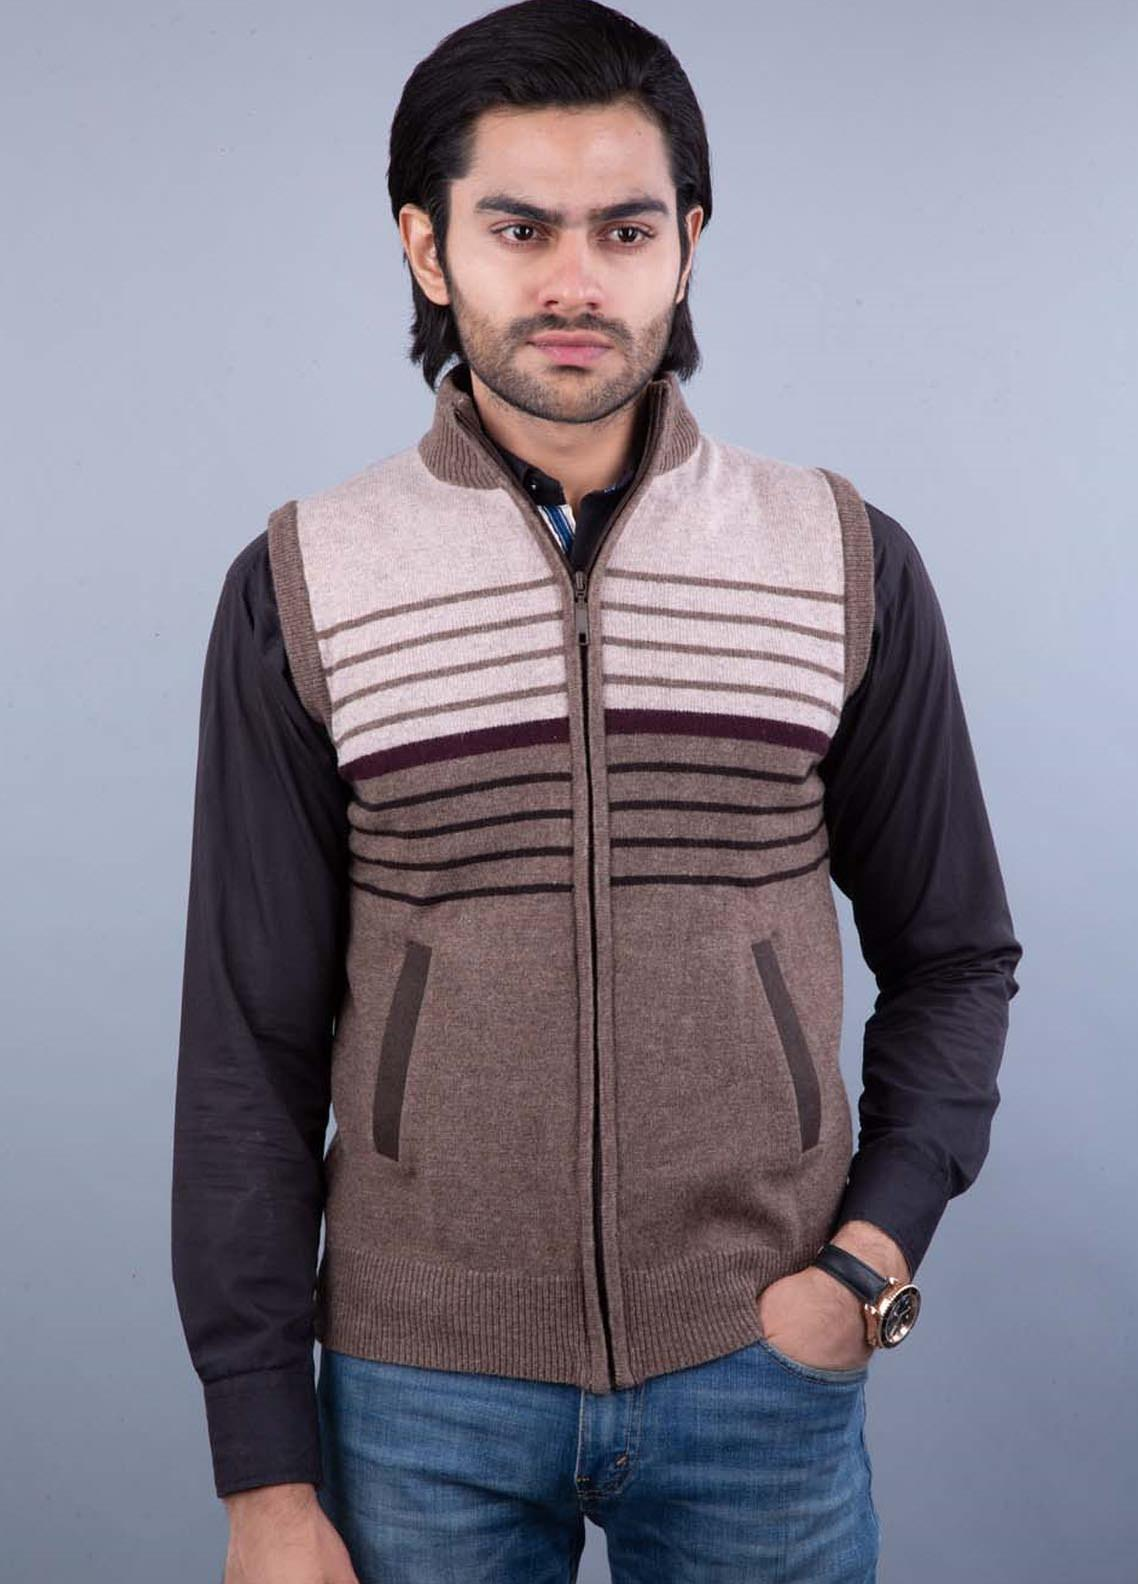 Oxford Lambswool Sleeveless Zipper Sweaters for Men -  521 S-L ZIP BROWN